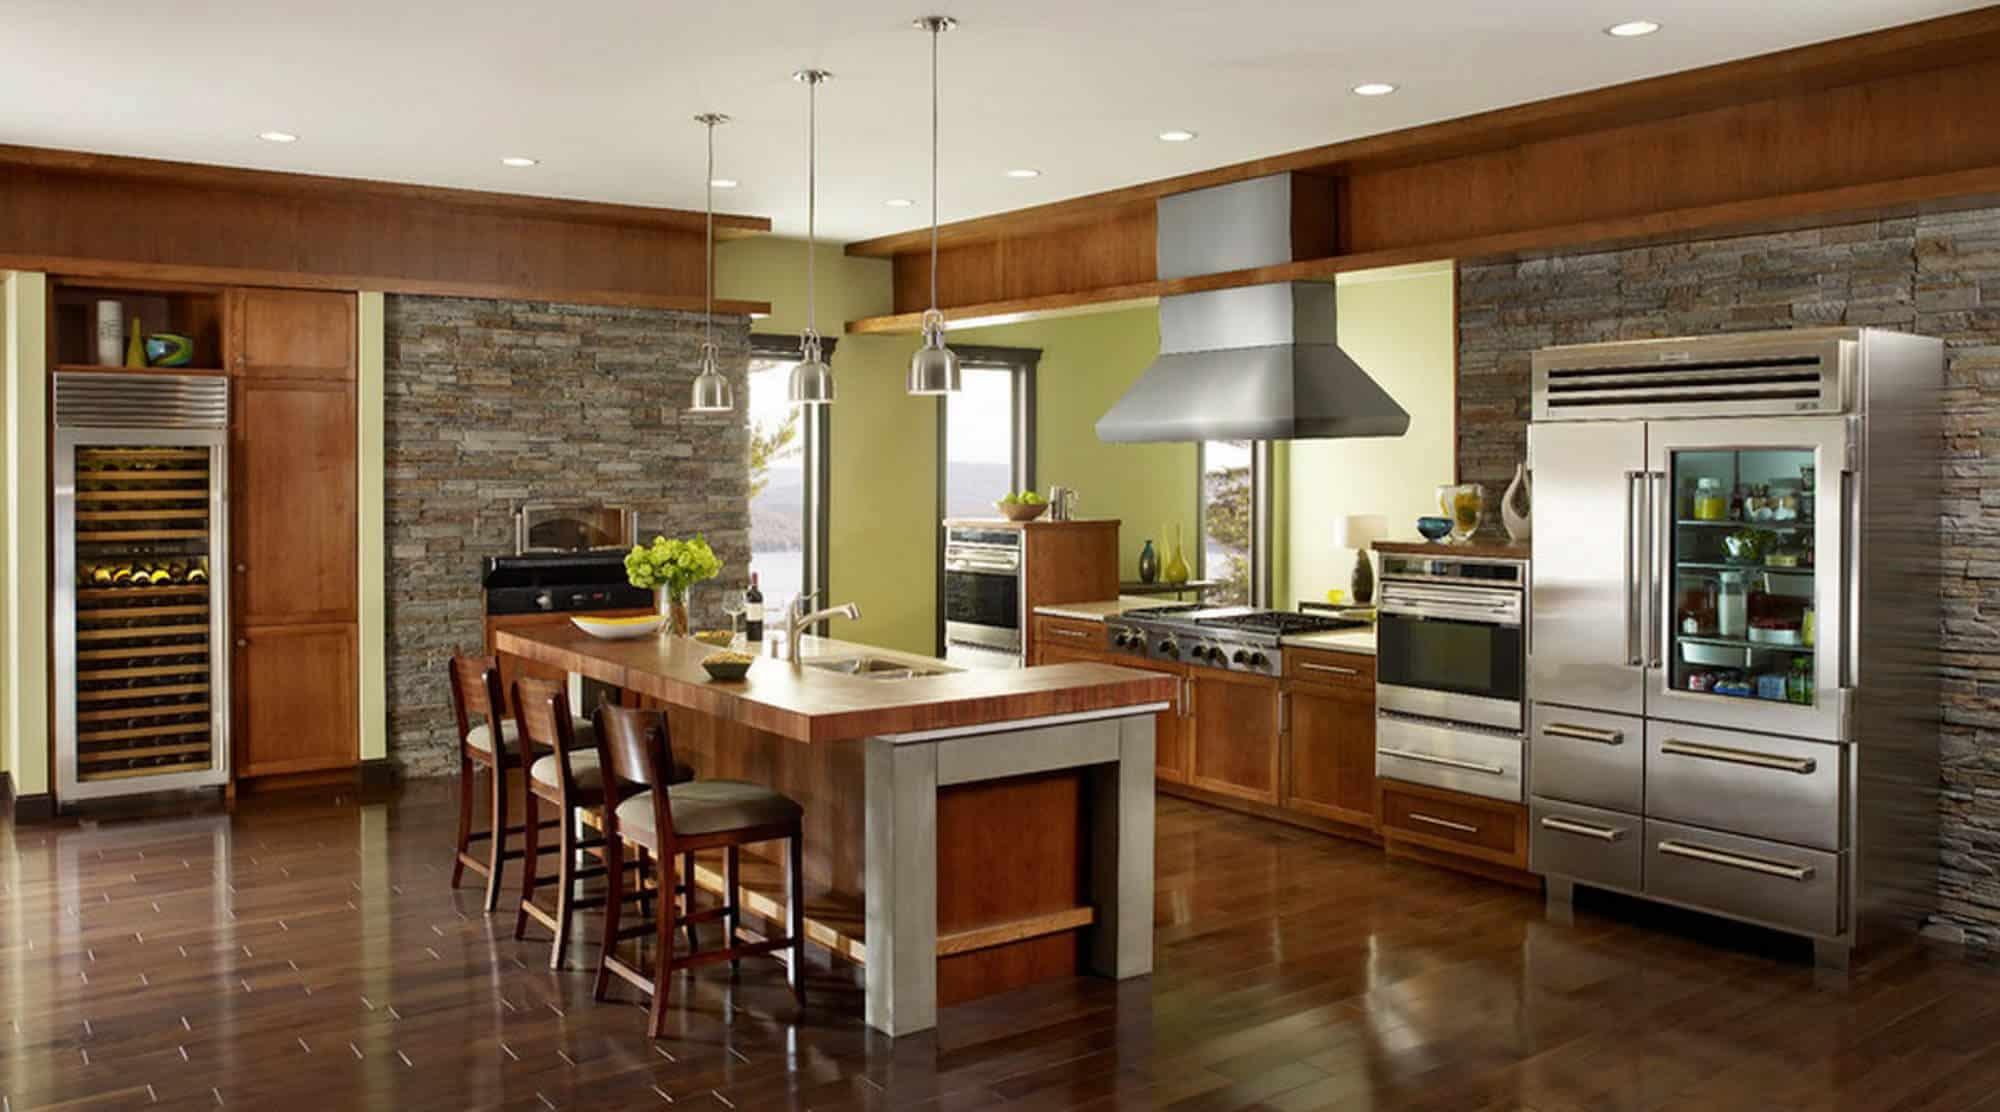 Kitchen Decor And Style Ideas